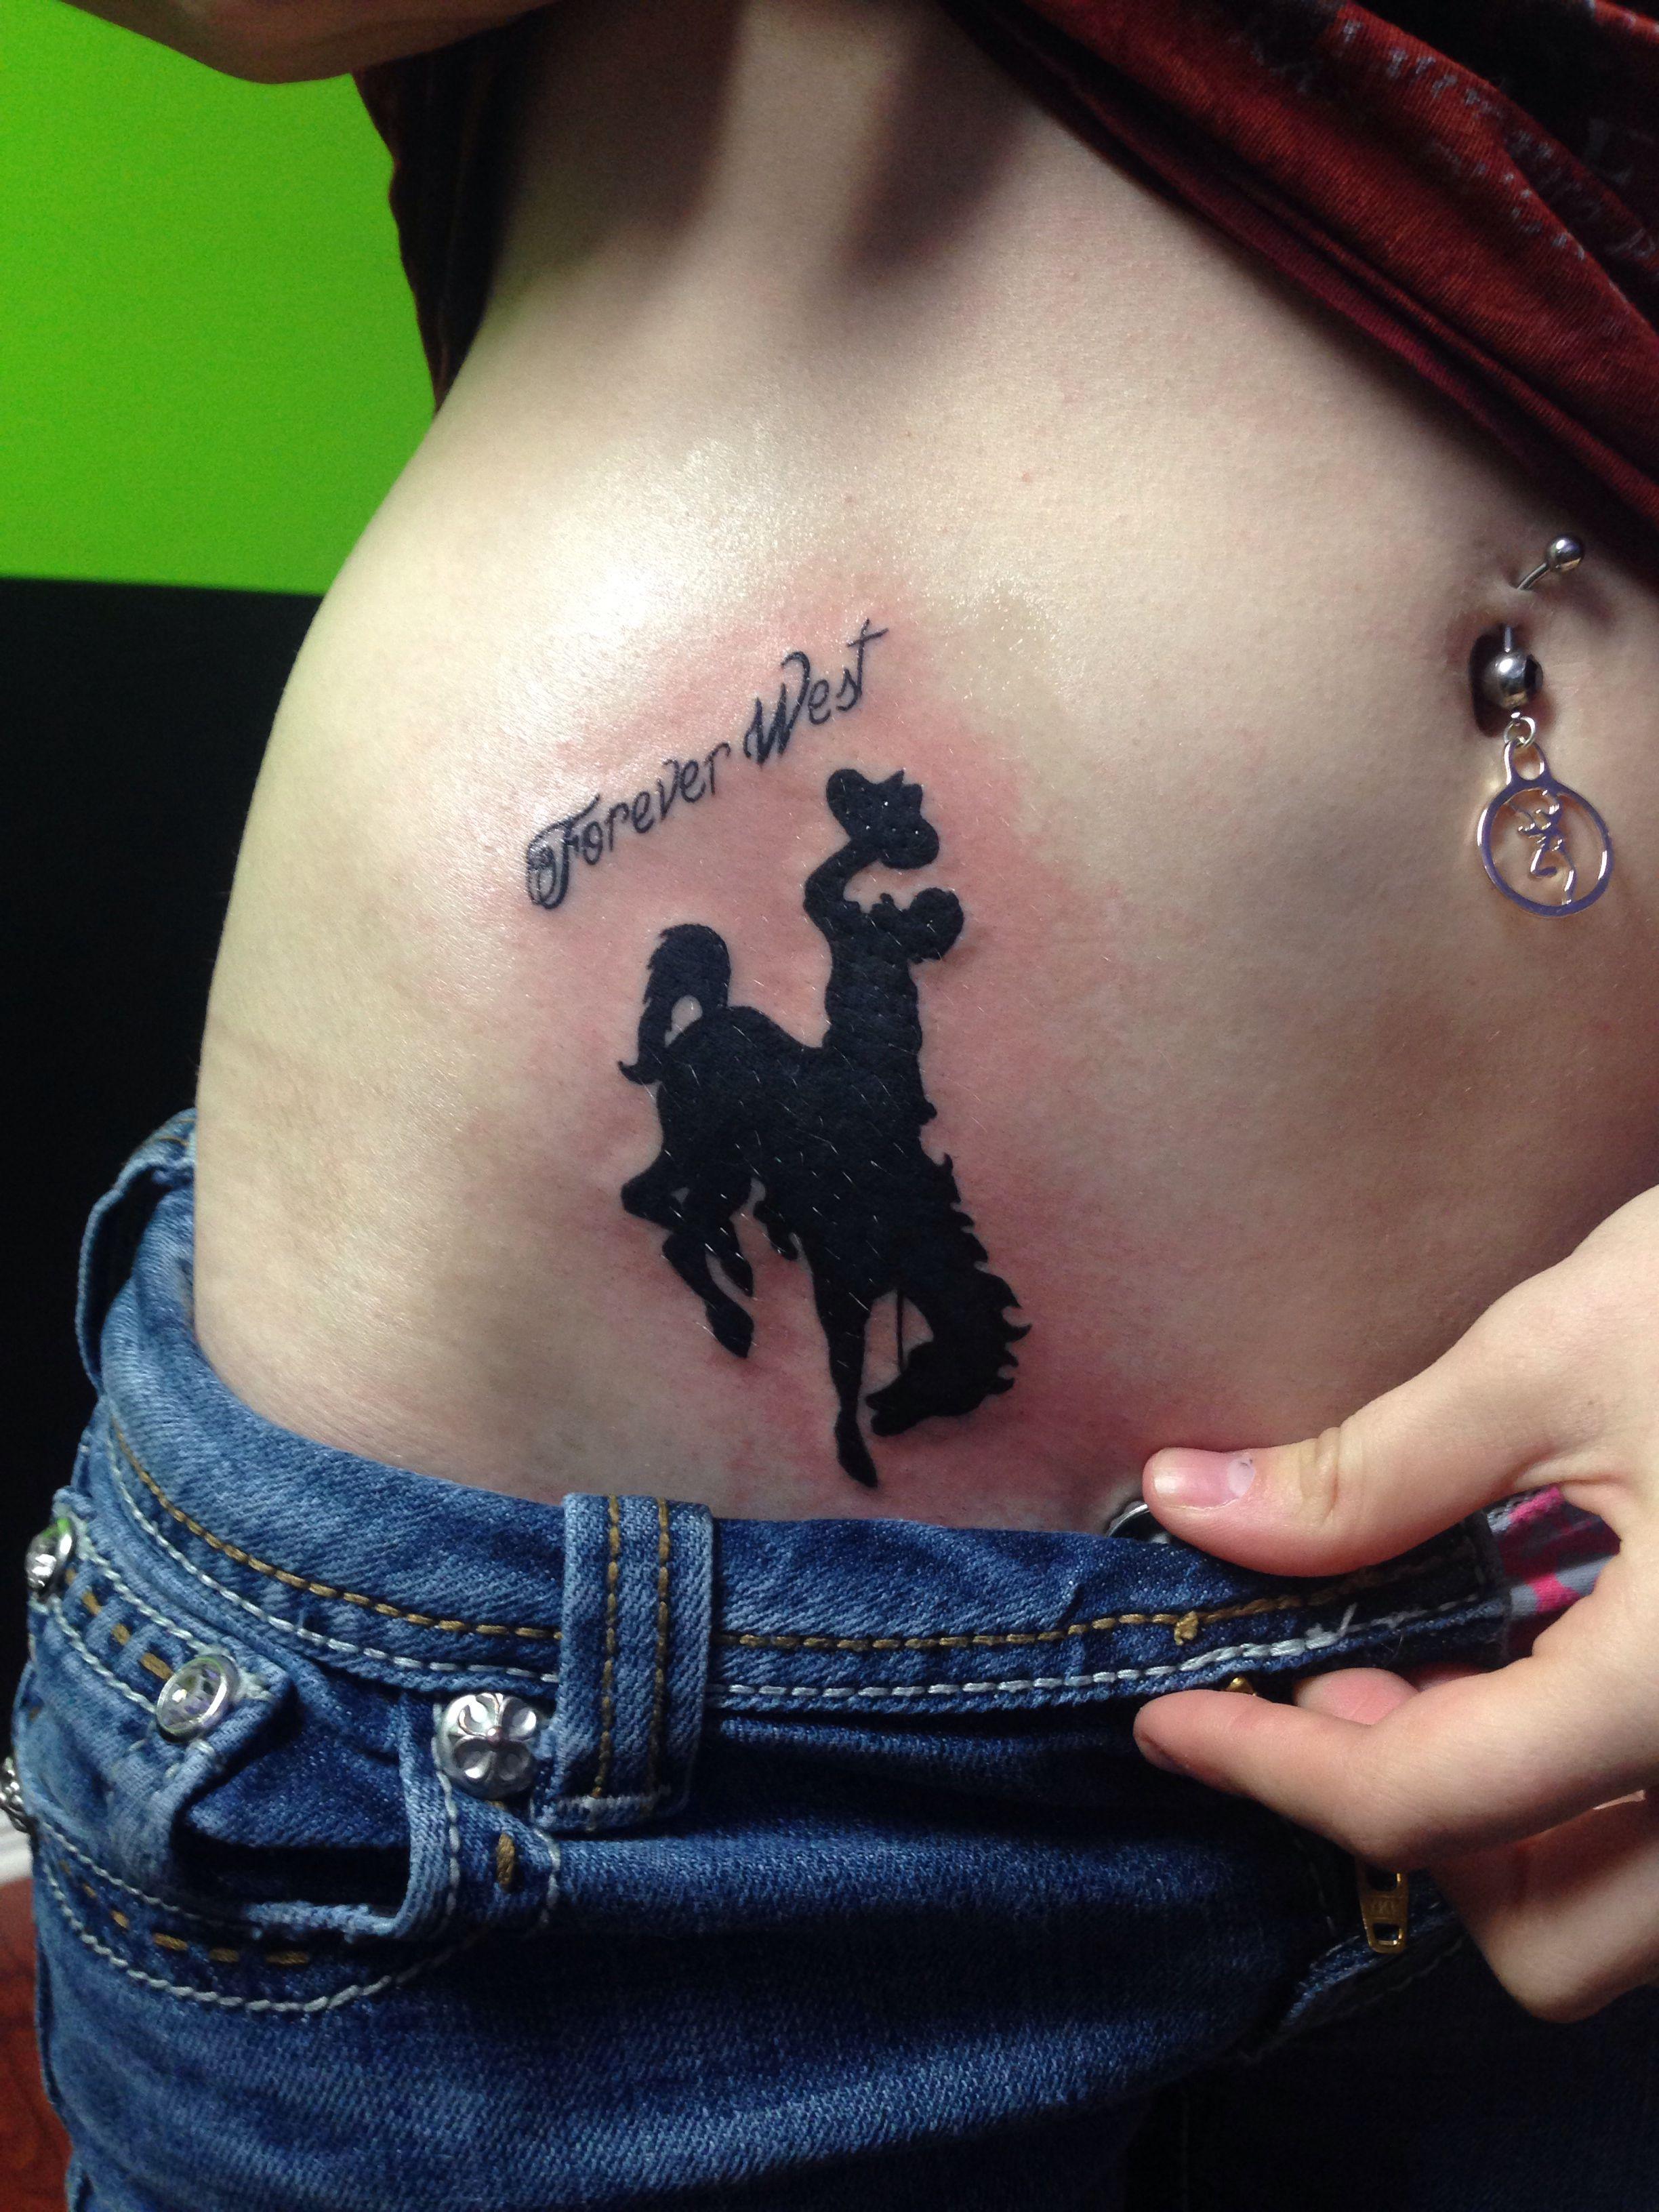 bucking horse tattoo tattoos pinterest horse tattoo and rh pinterest com Bucking Horse with Wings Tattoo bucking horse tattoo designs